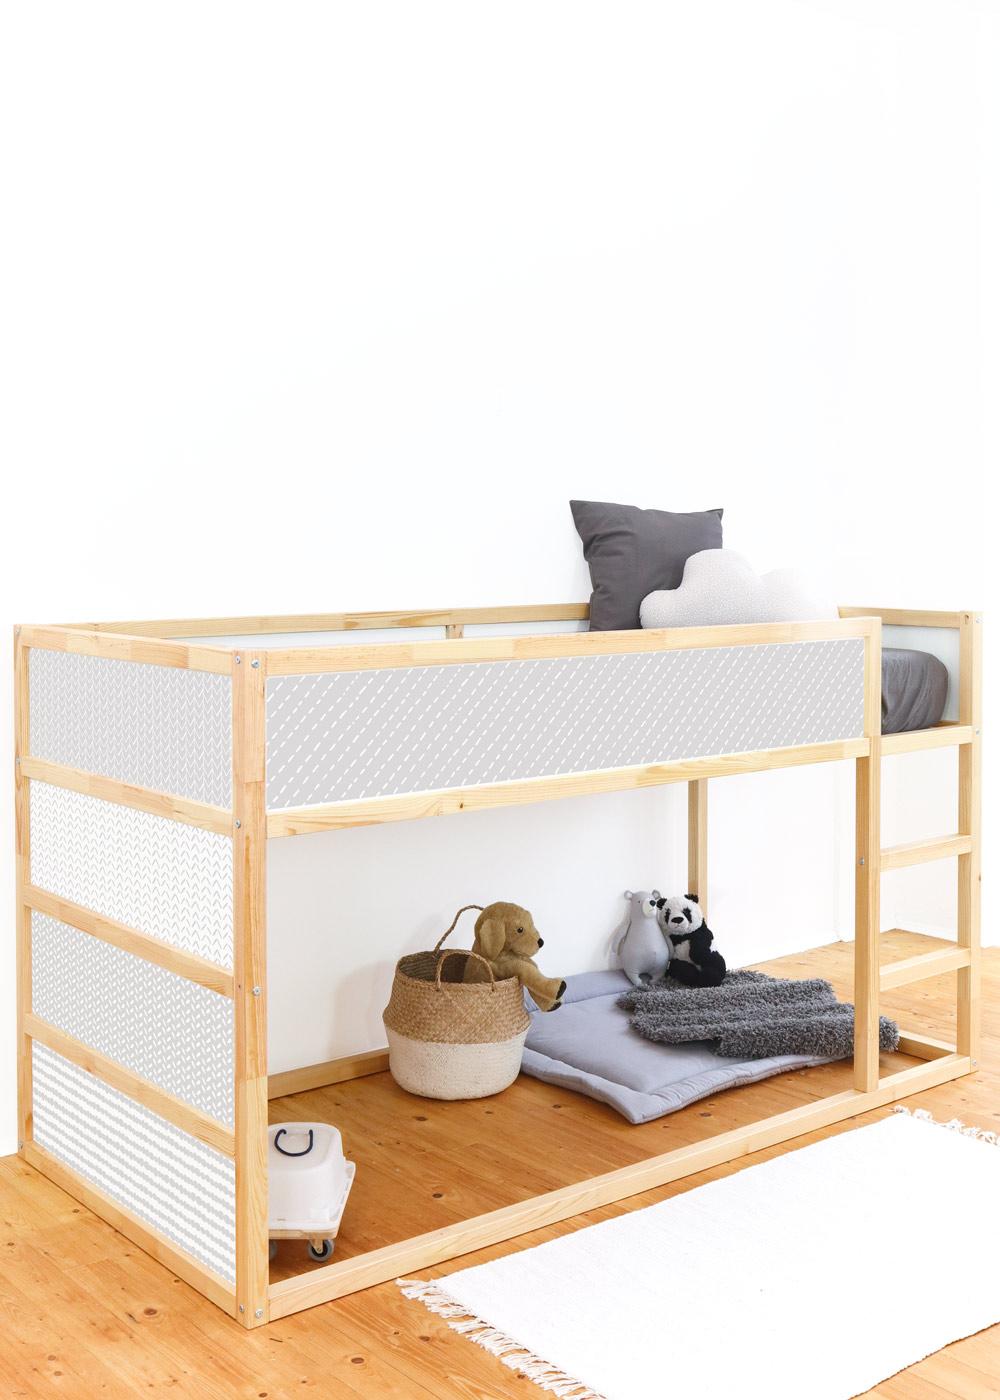 Ikea Kuras Hochbett Musta hellgrau Gesamtansicht